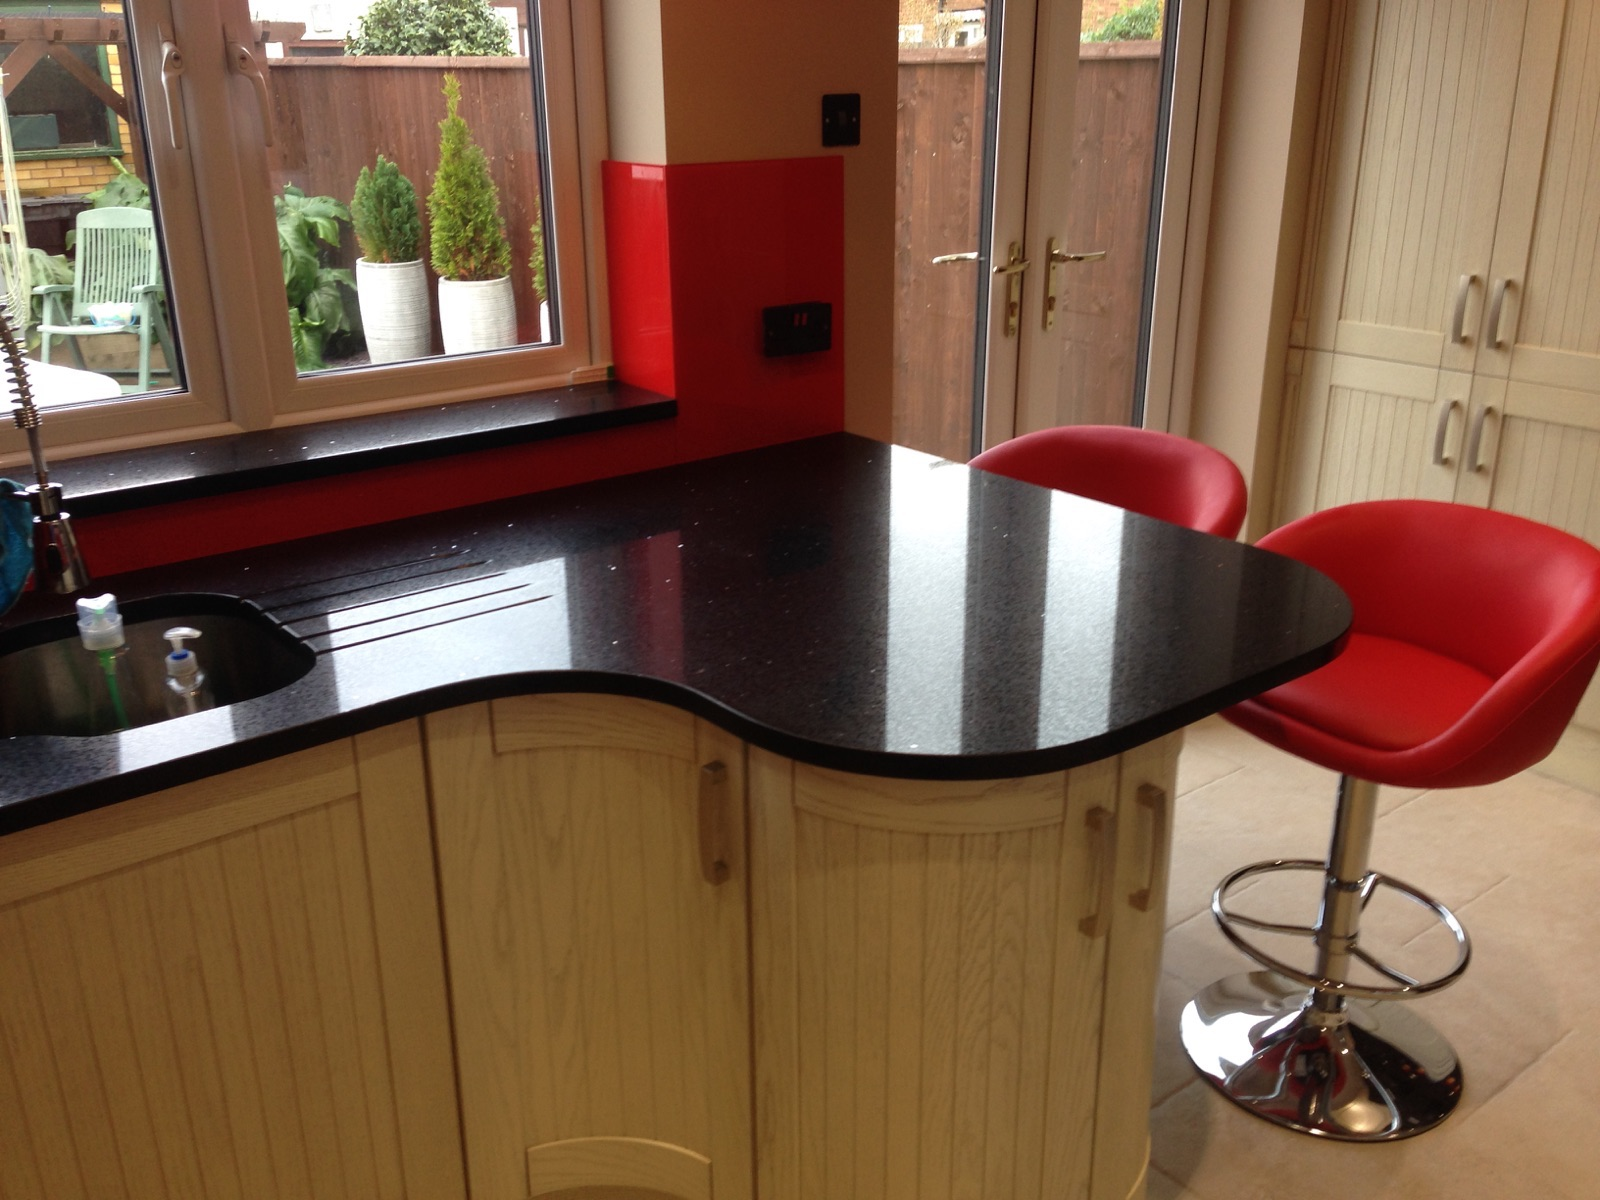 Black Graite woktop and red glass splashback in London (4)